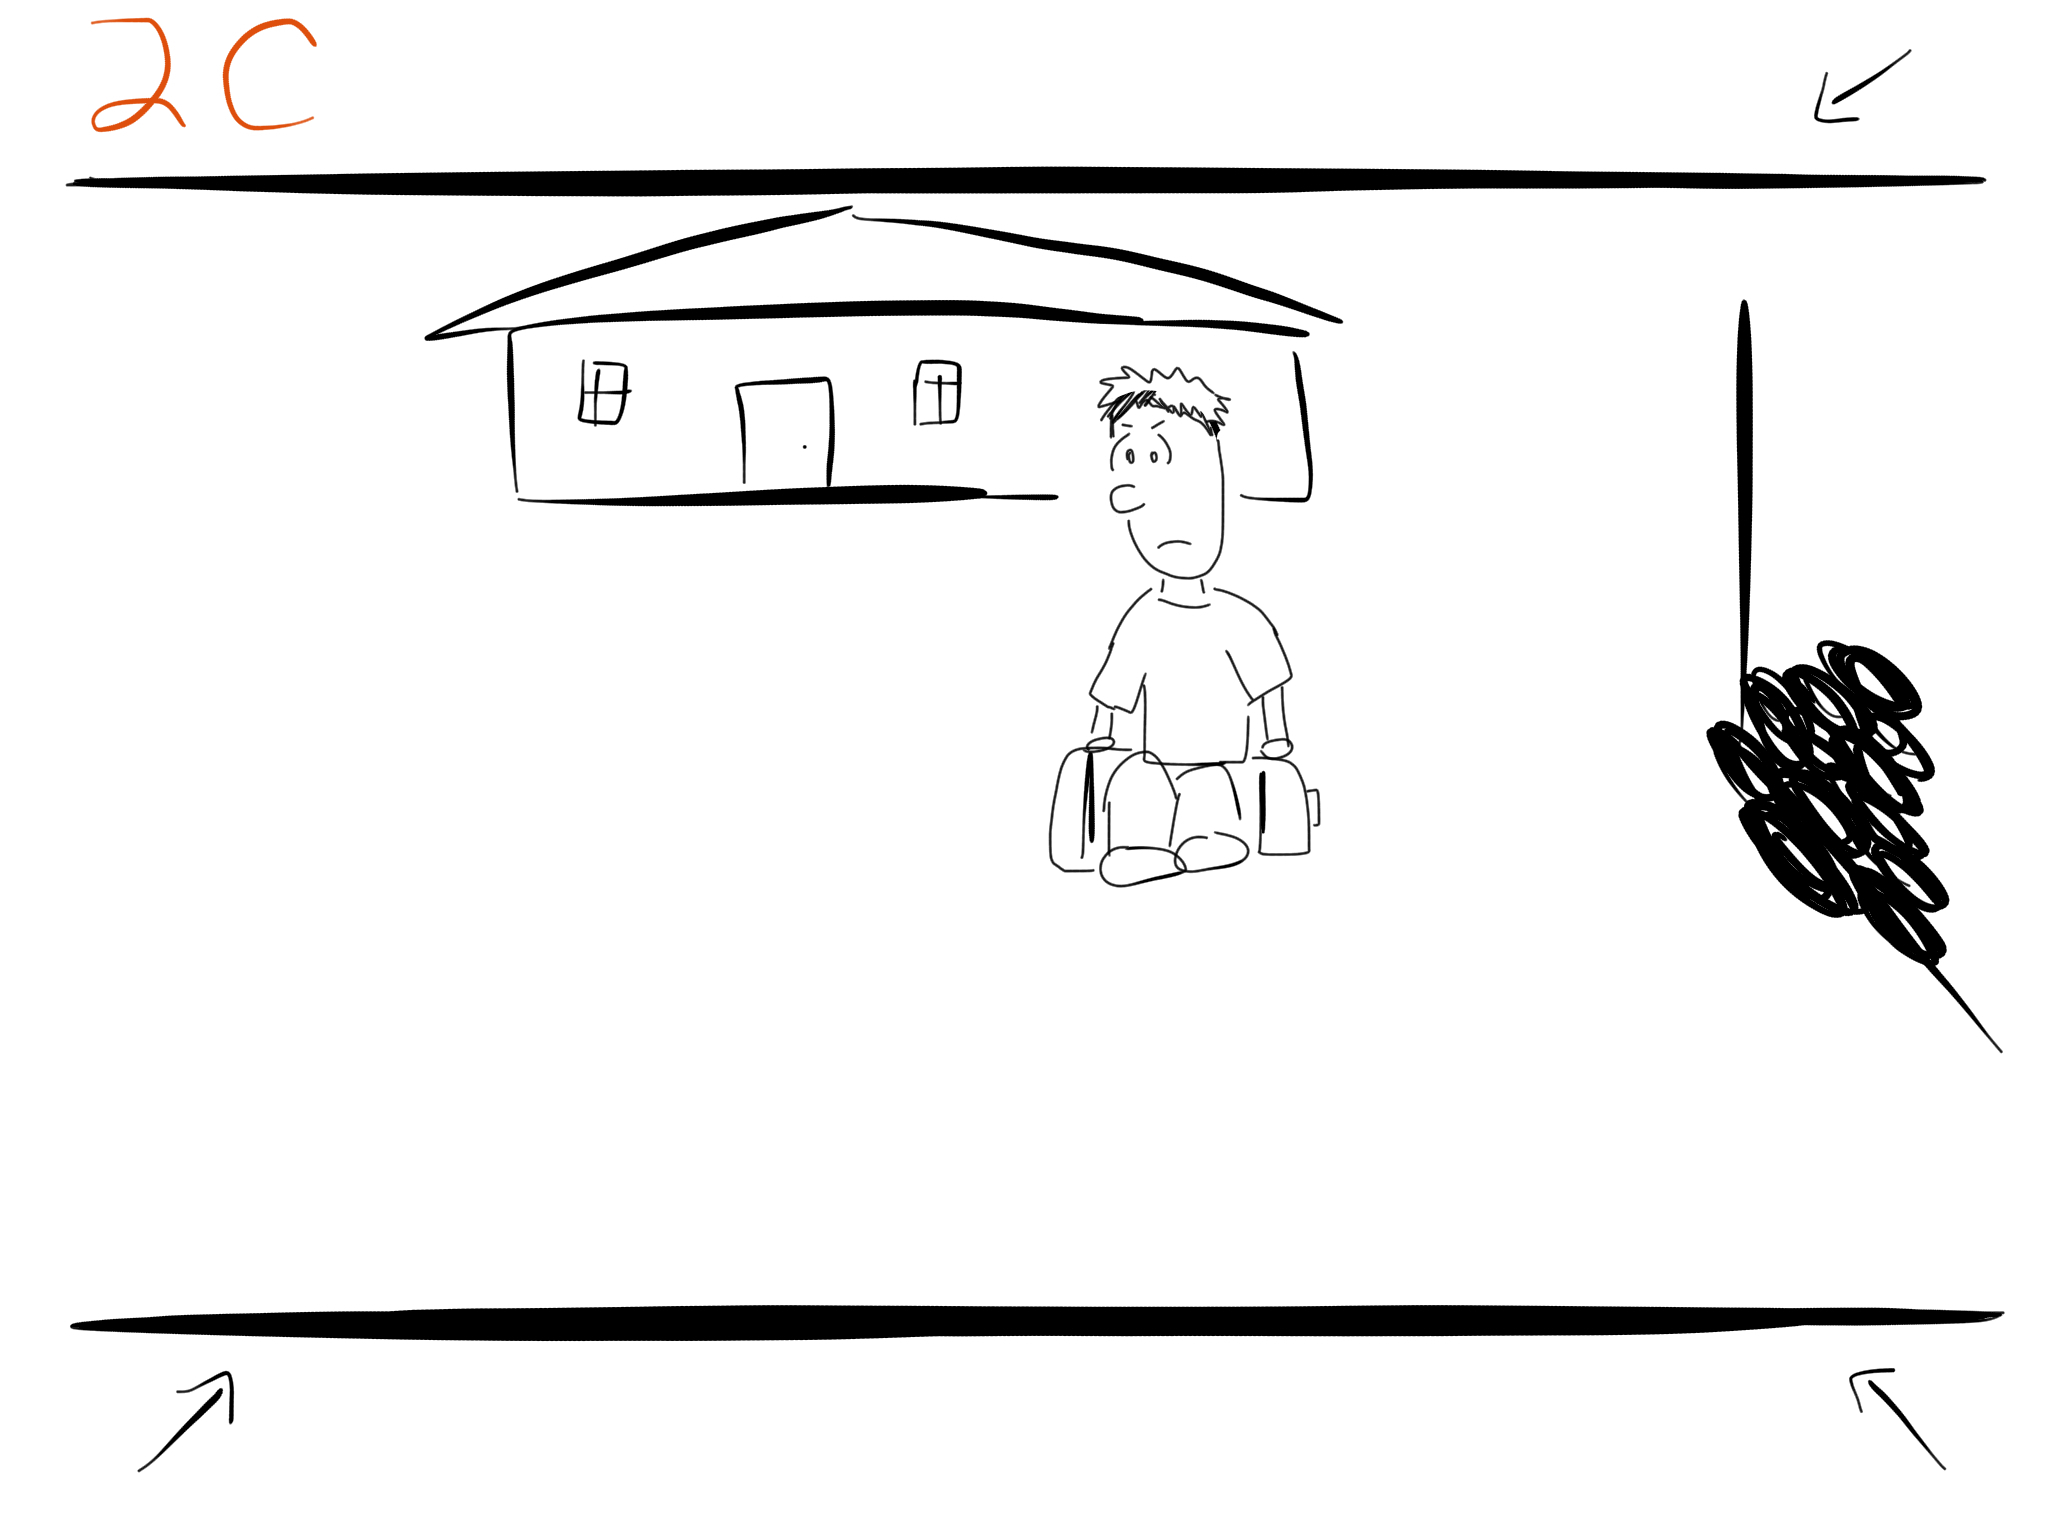 BDF_Storyboards_04.jpg